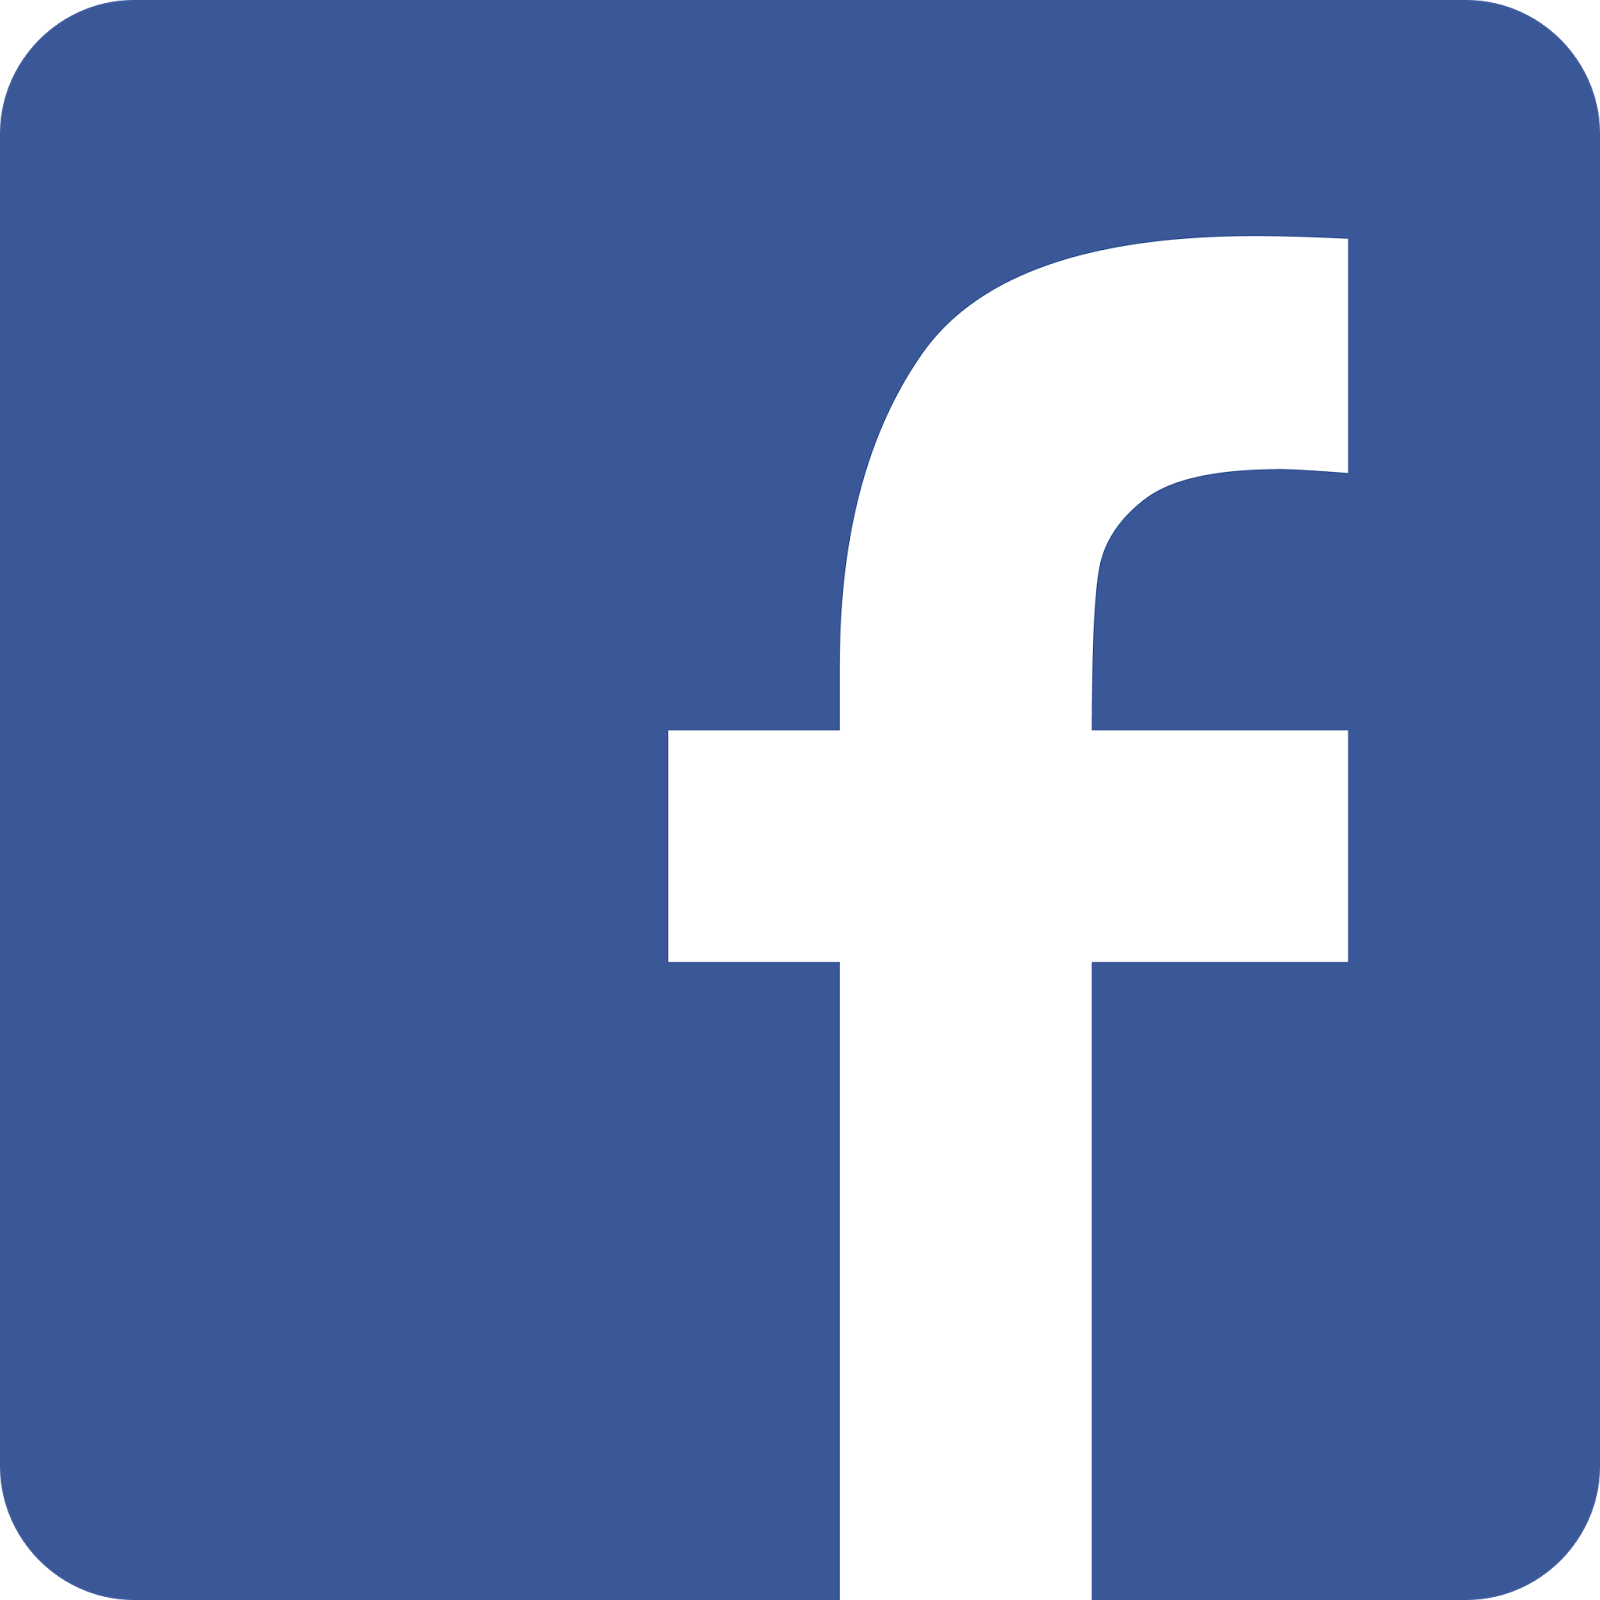 facebook-transparent-logo-png-0.png